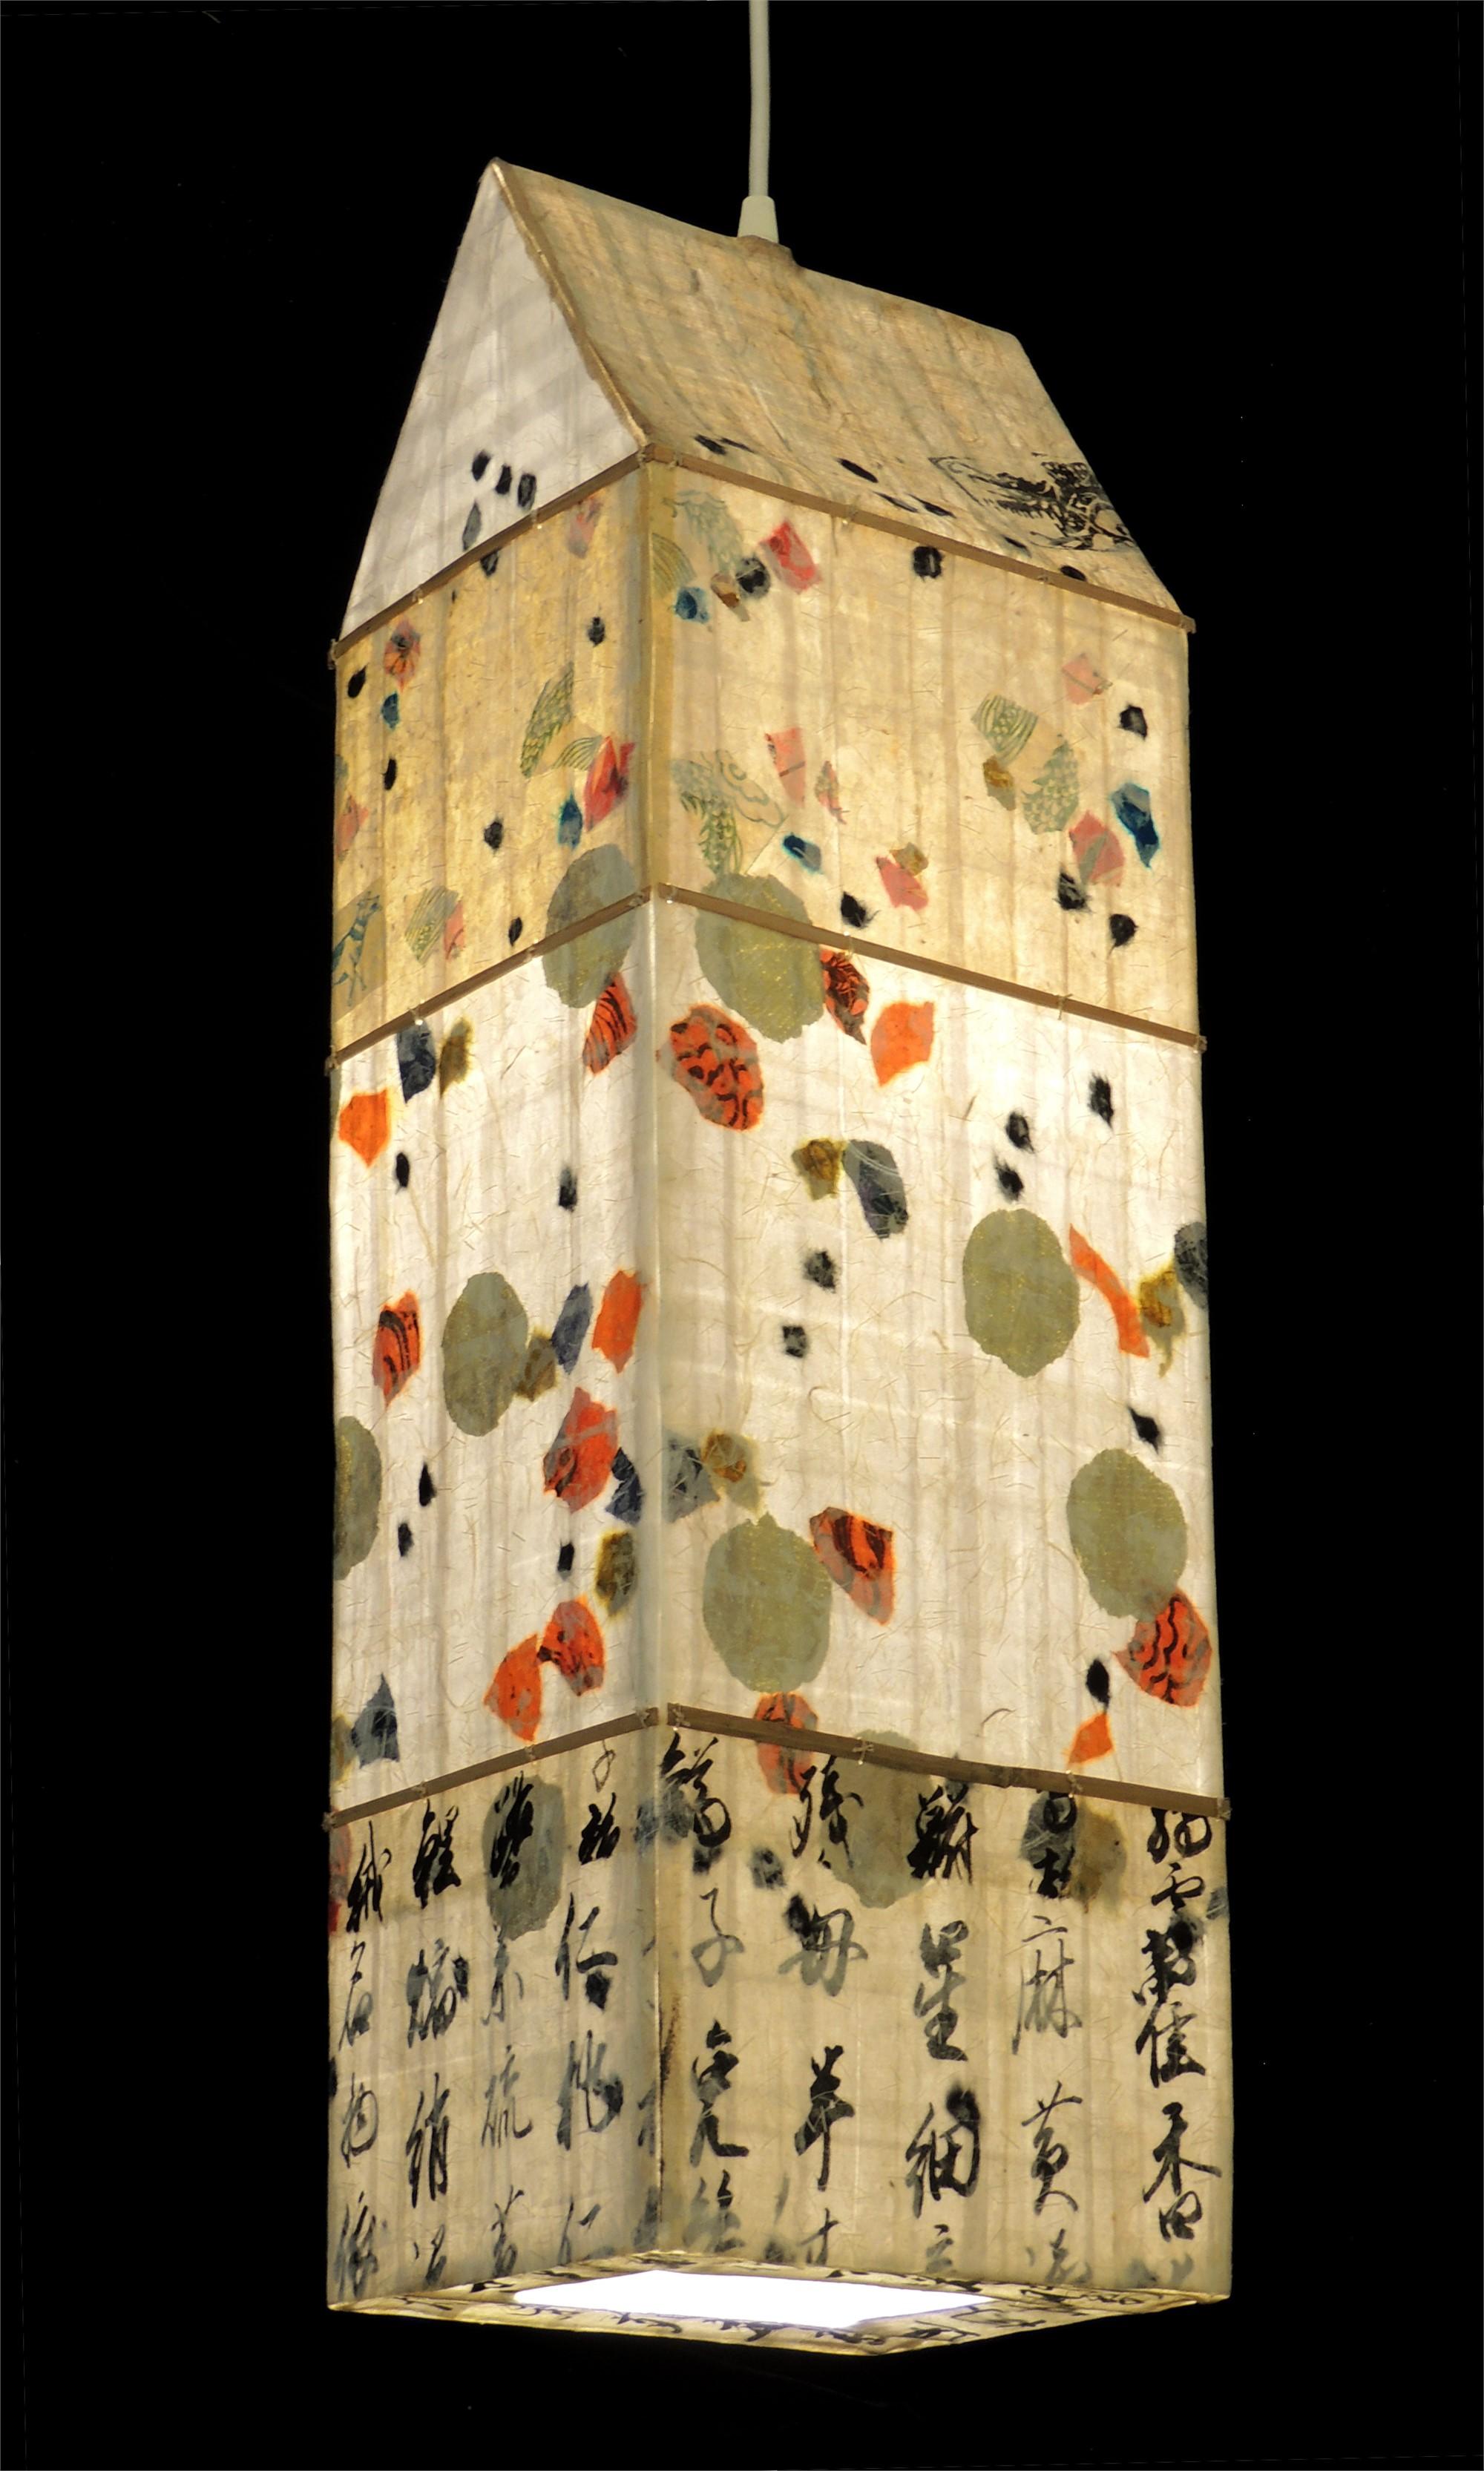 Gingko Sand Spirit House Lantern by Elaine Hanowell